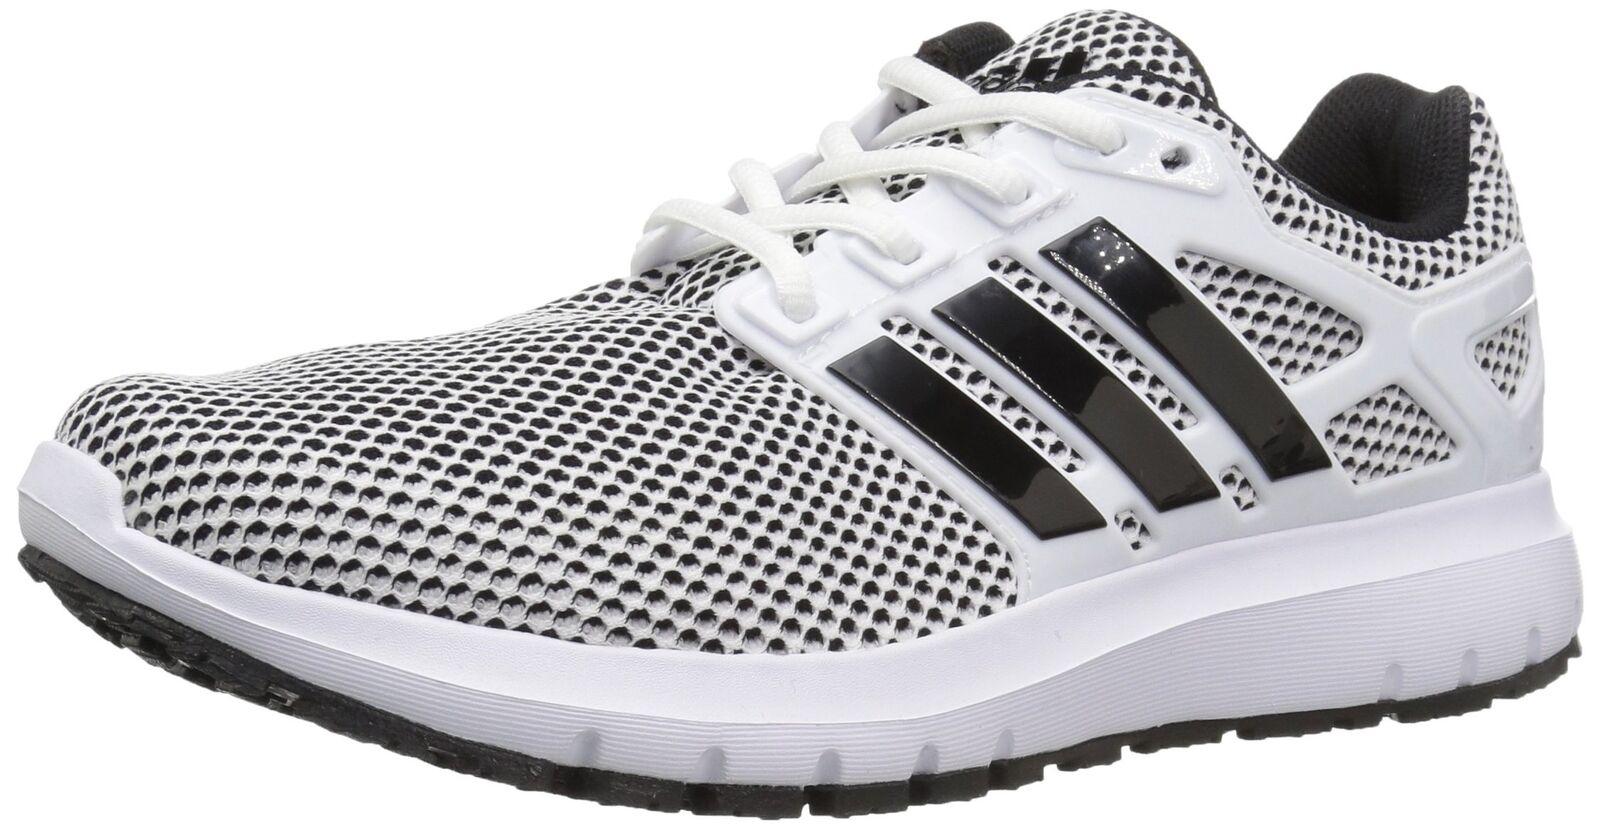 Adidas  Men's Energy Cloud m Running shoes White Black Black 10.5 M US